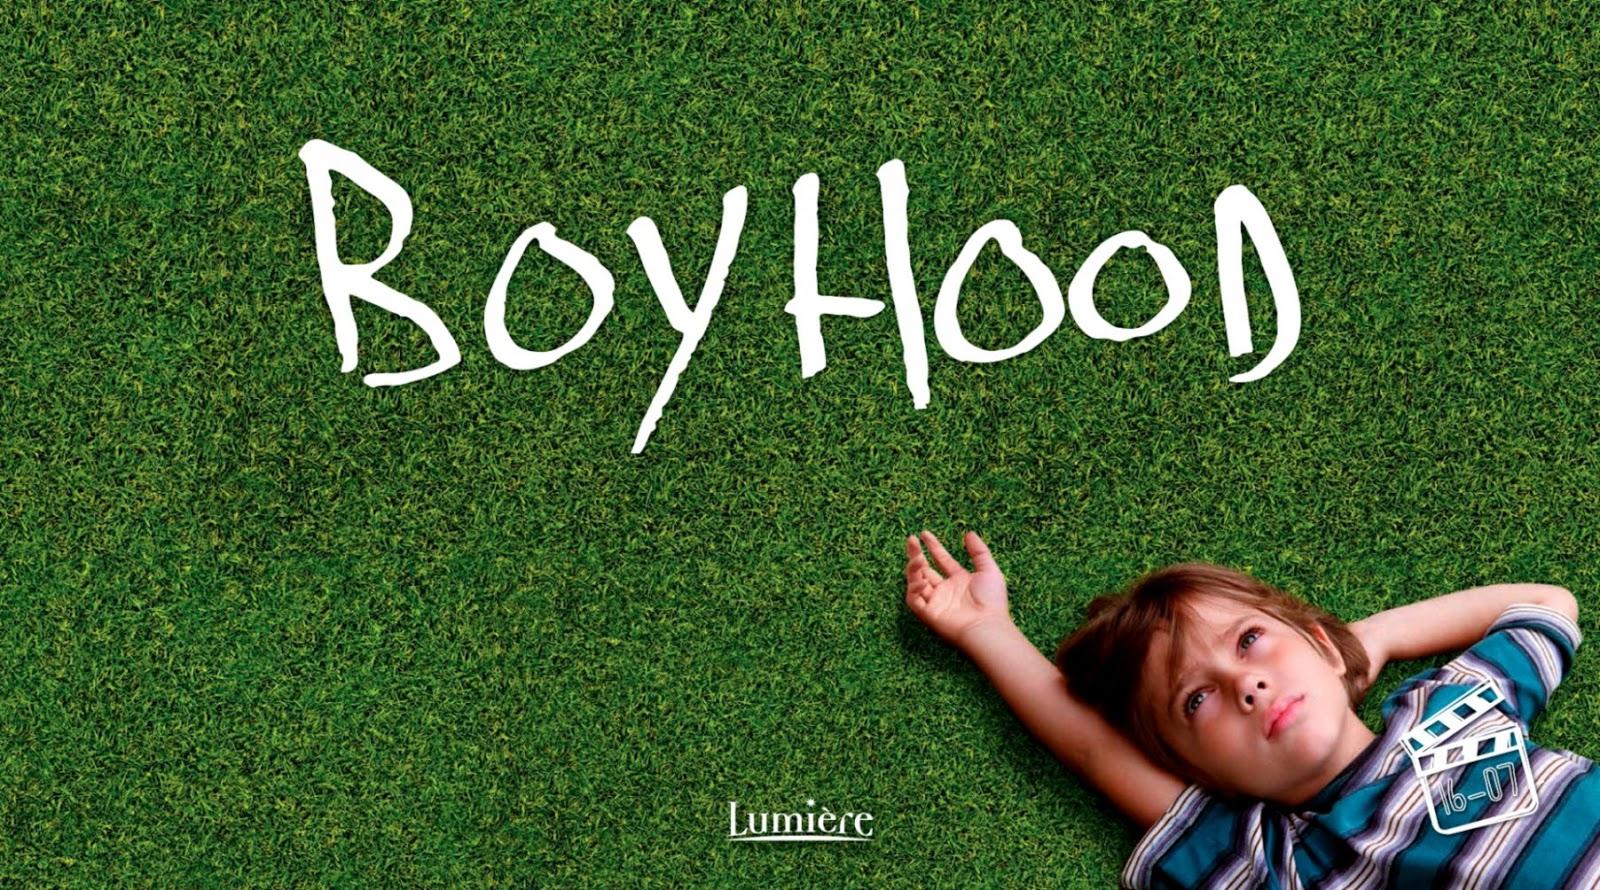 Official 2014 Boyhood Film Wallpaper PaperPull